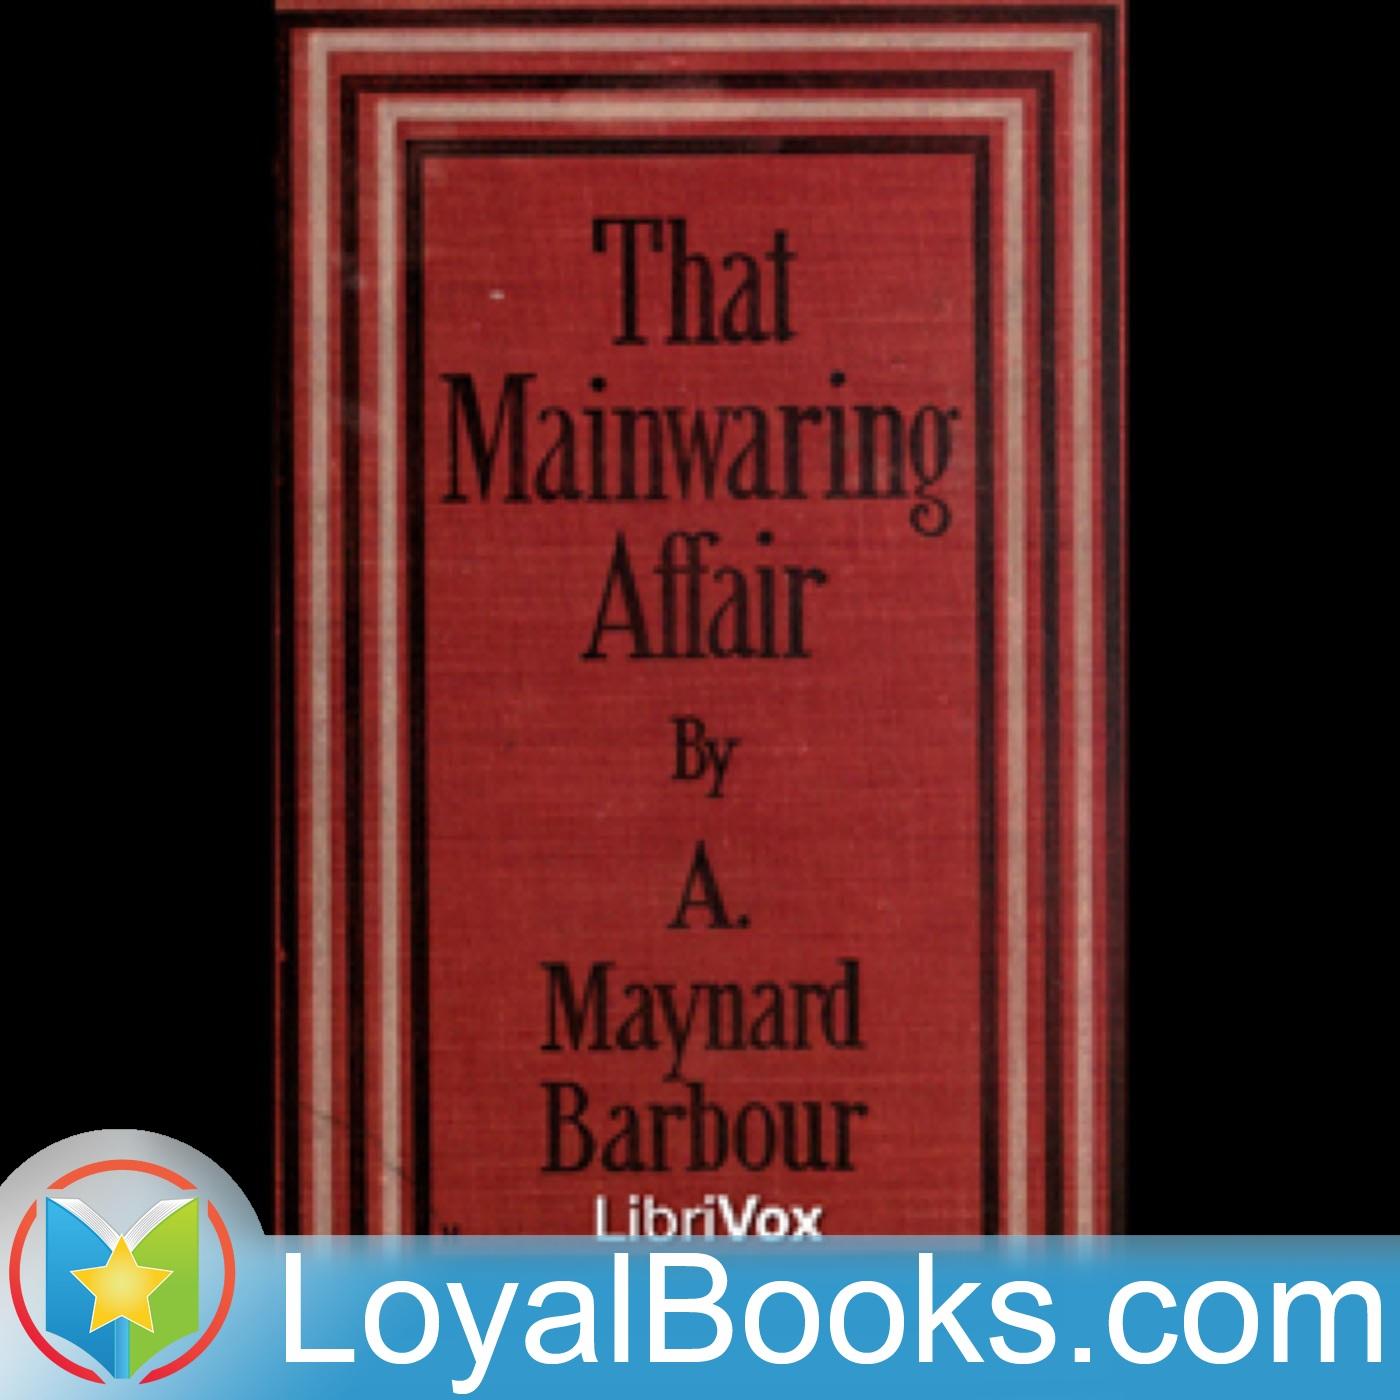 <![CDATA[That Mainwaring Affair by Anna Maynard Barbour]]>